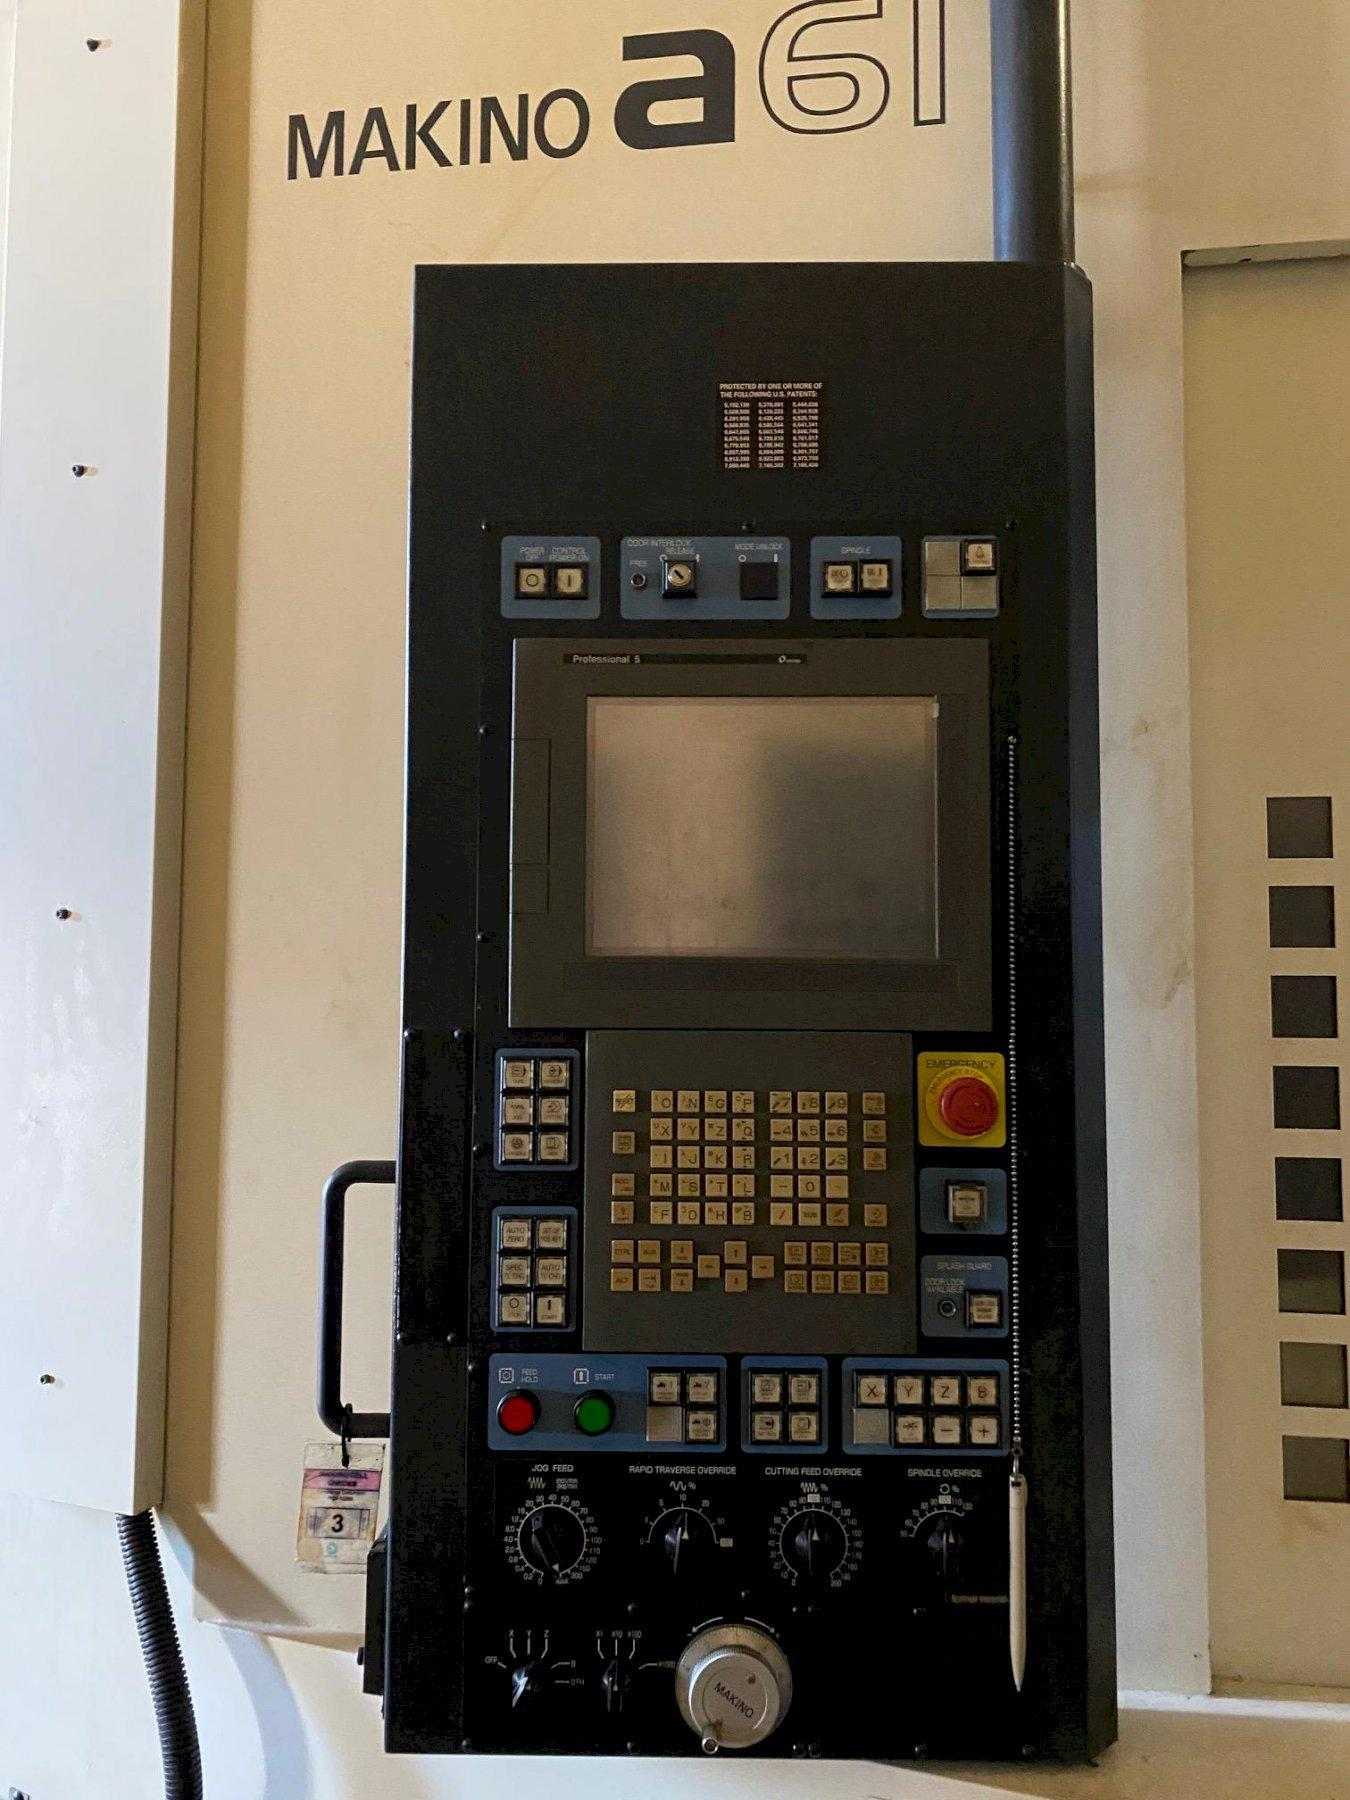 2008 Makino A61 - CNC Horizontal Machining Center